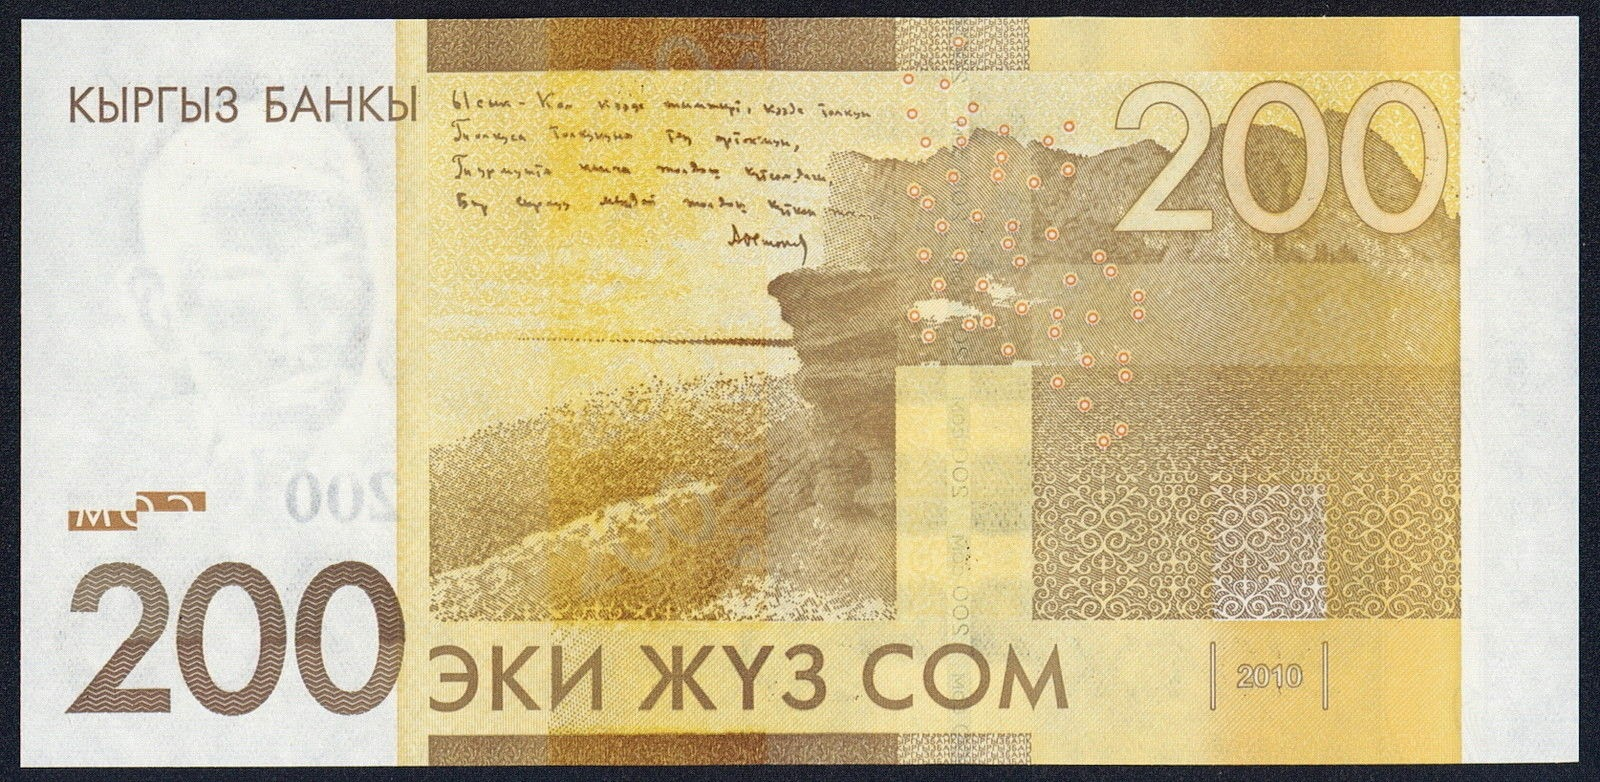 Kyrgyzstan Banknotes 200 Som note